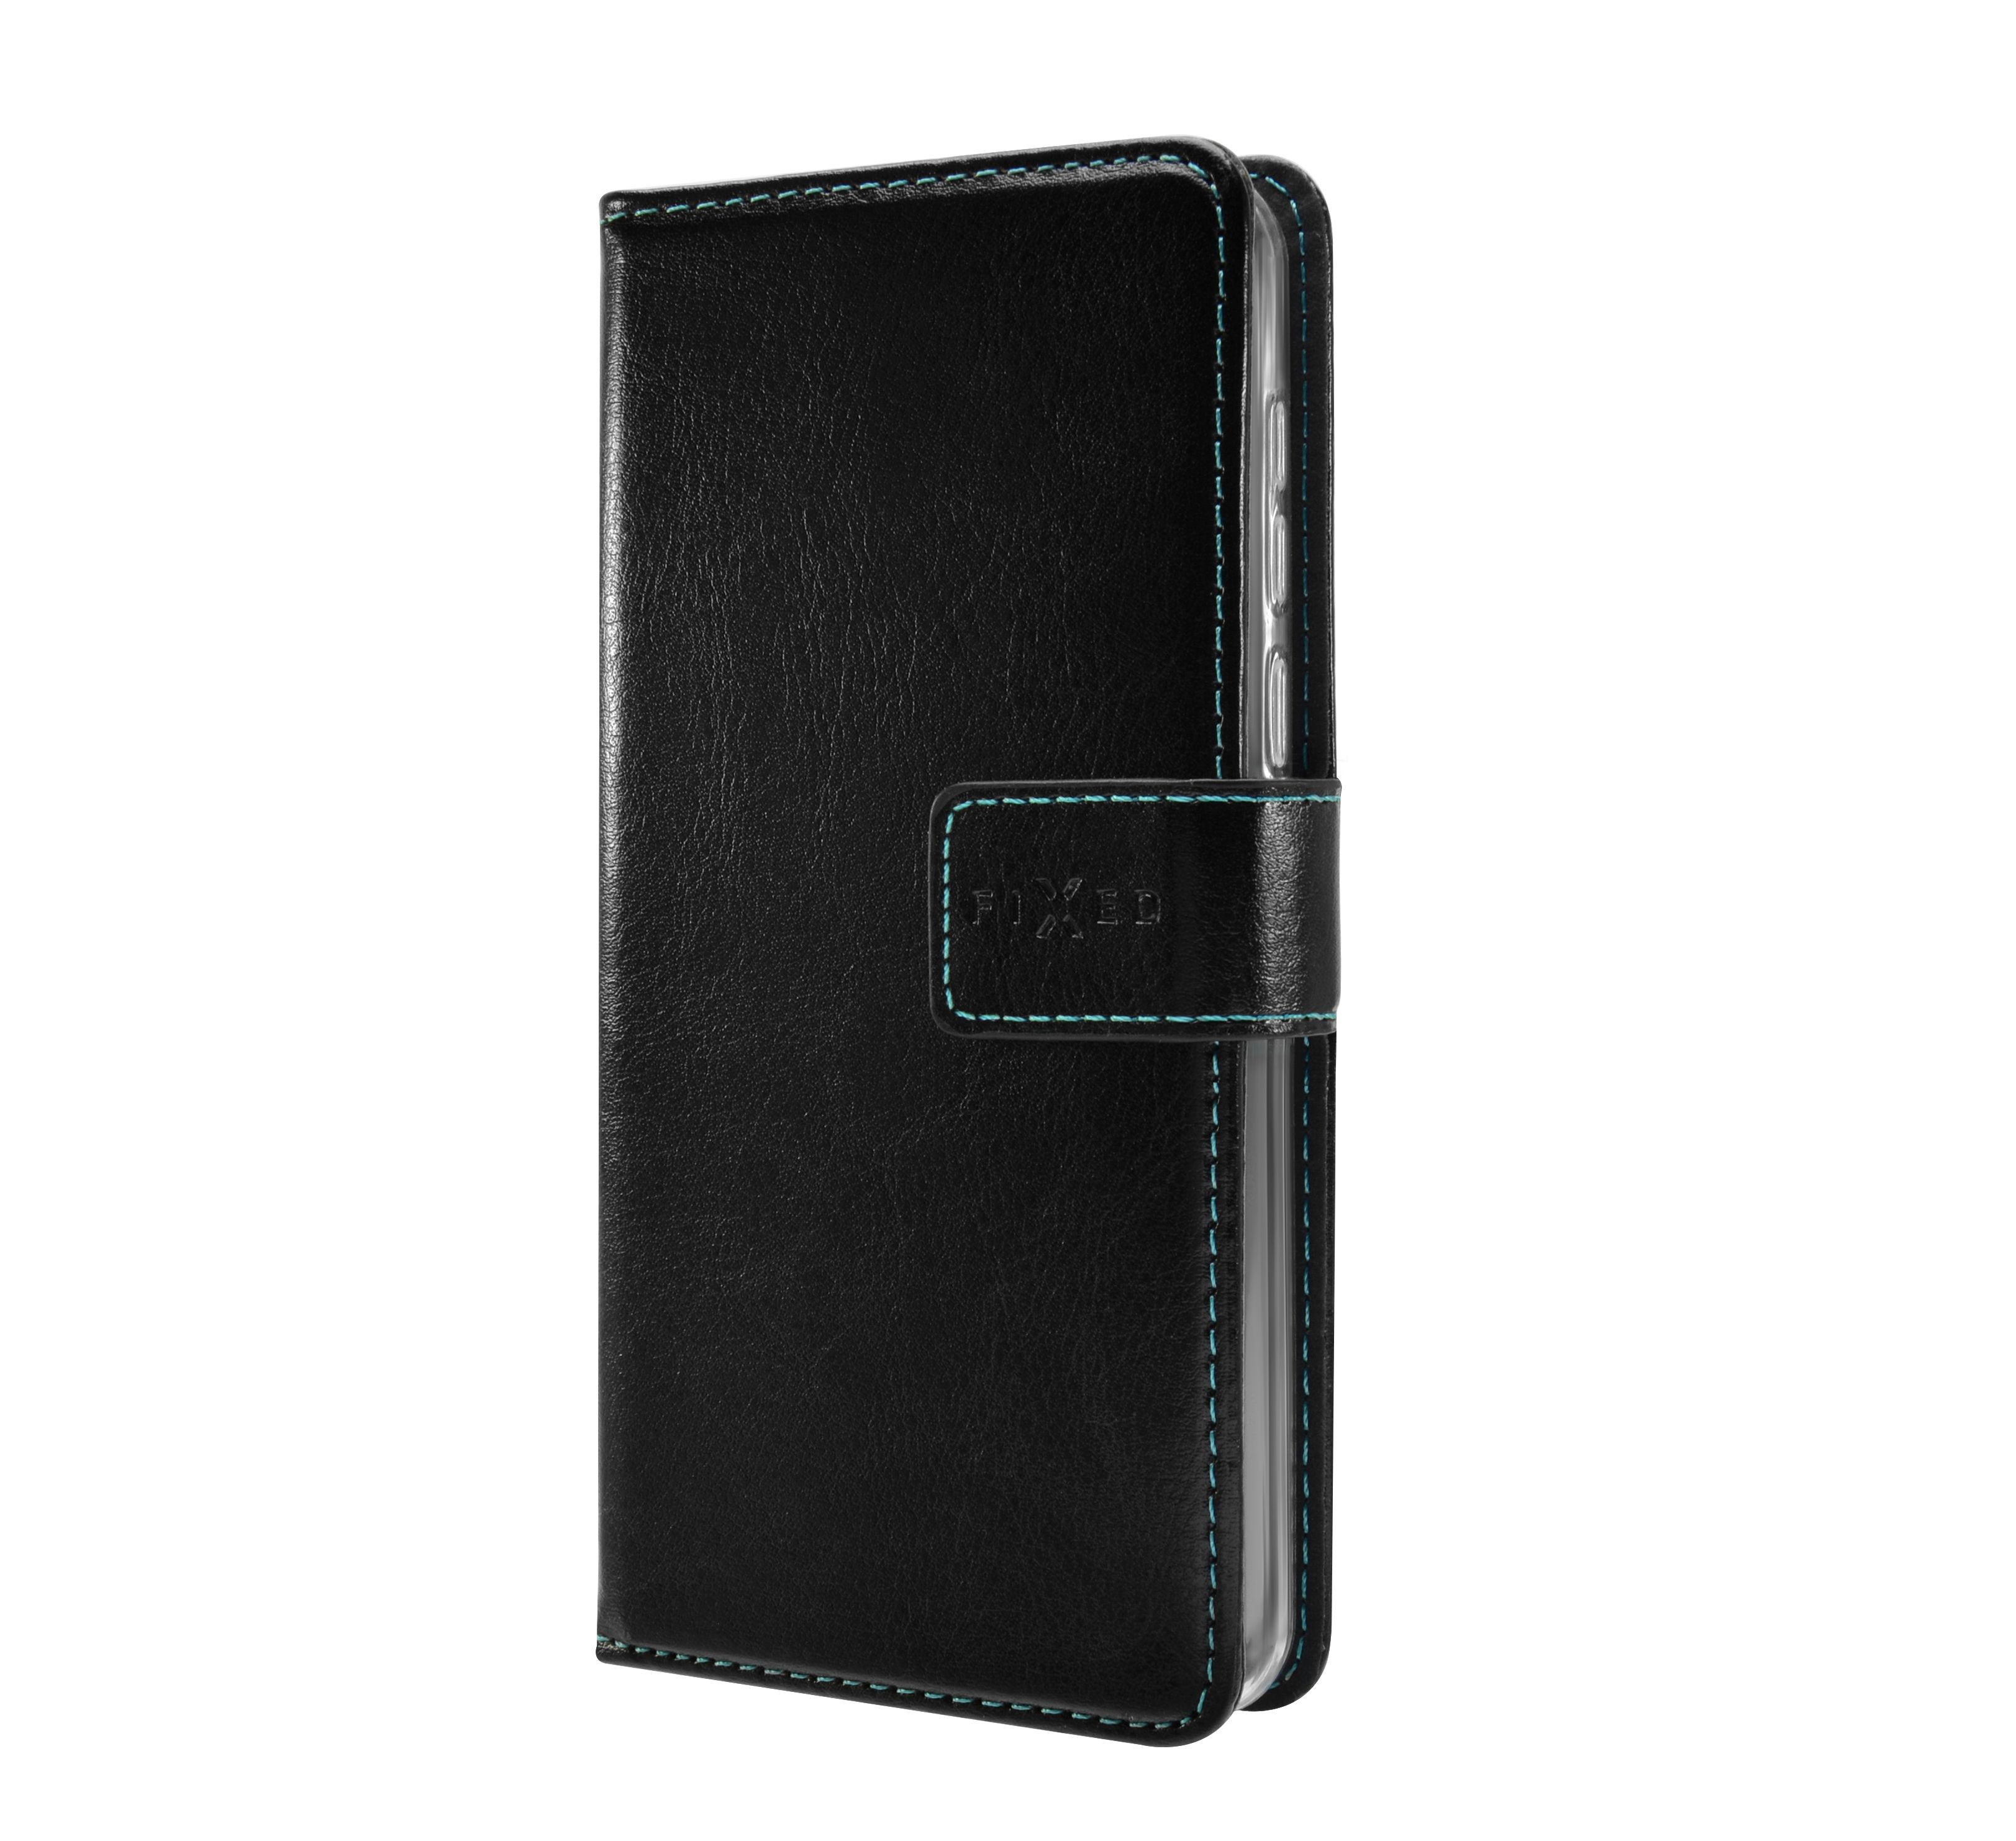 FIXED Opus flipové pouzdro pro Nokia 6.1 Plus, černé